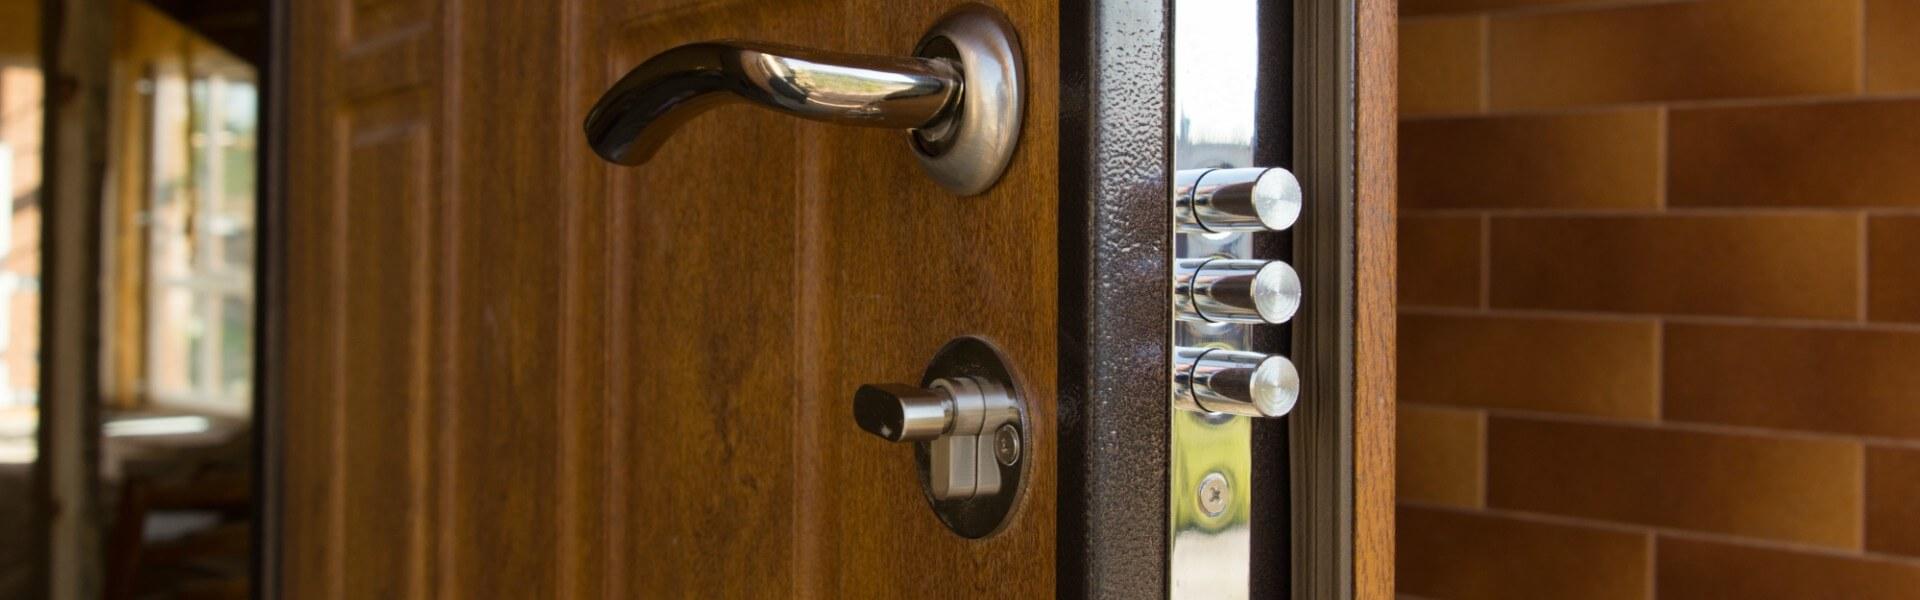 Georgetown Locksmith Pros - Deadbolt Locks